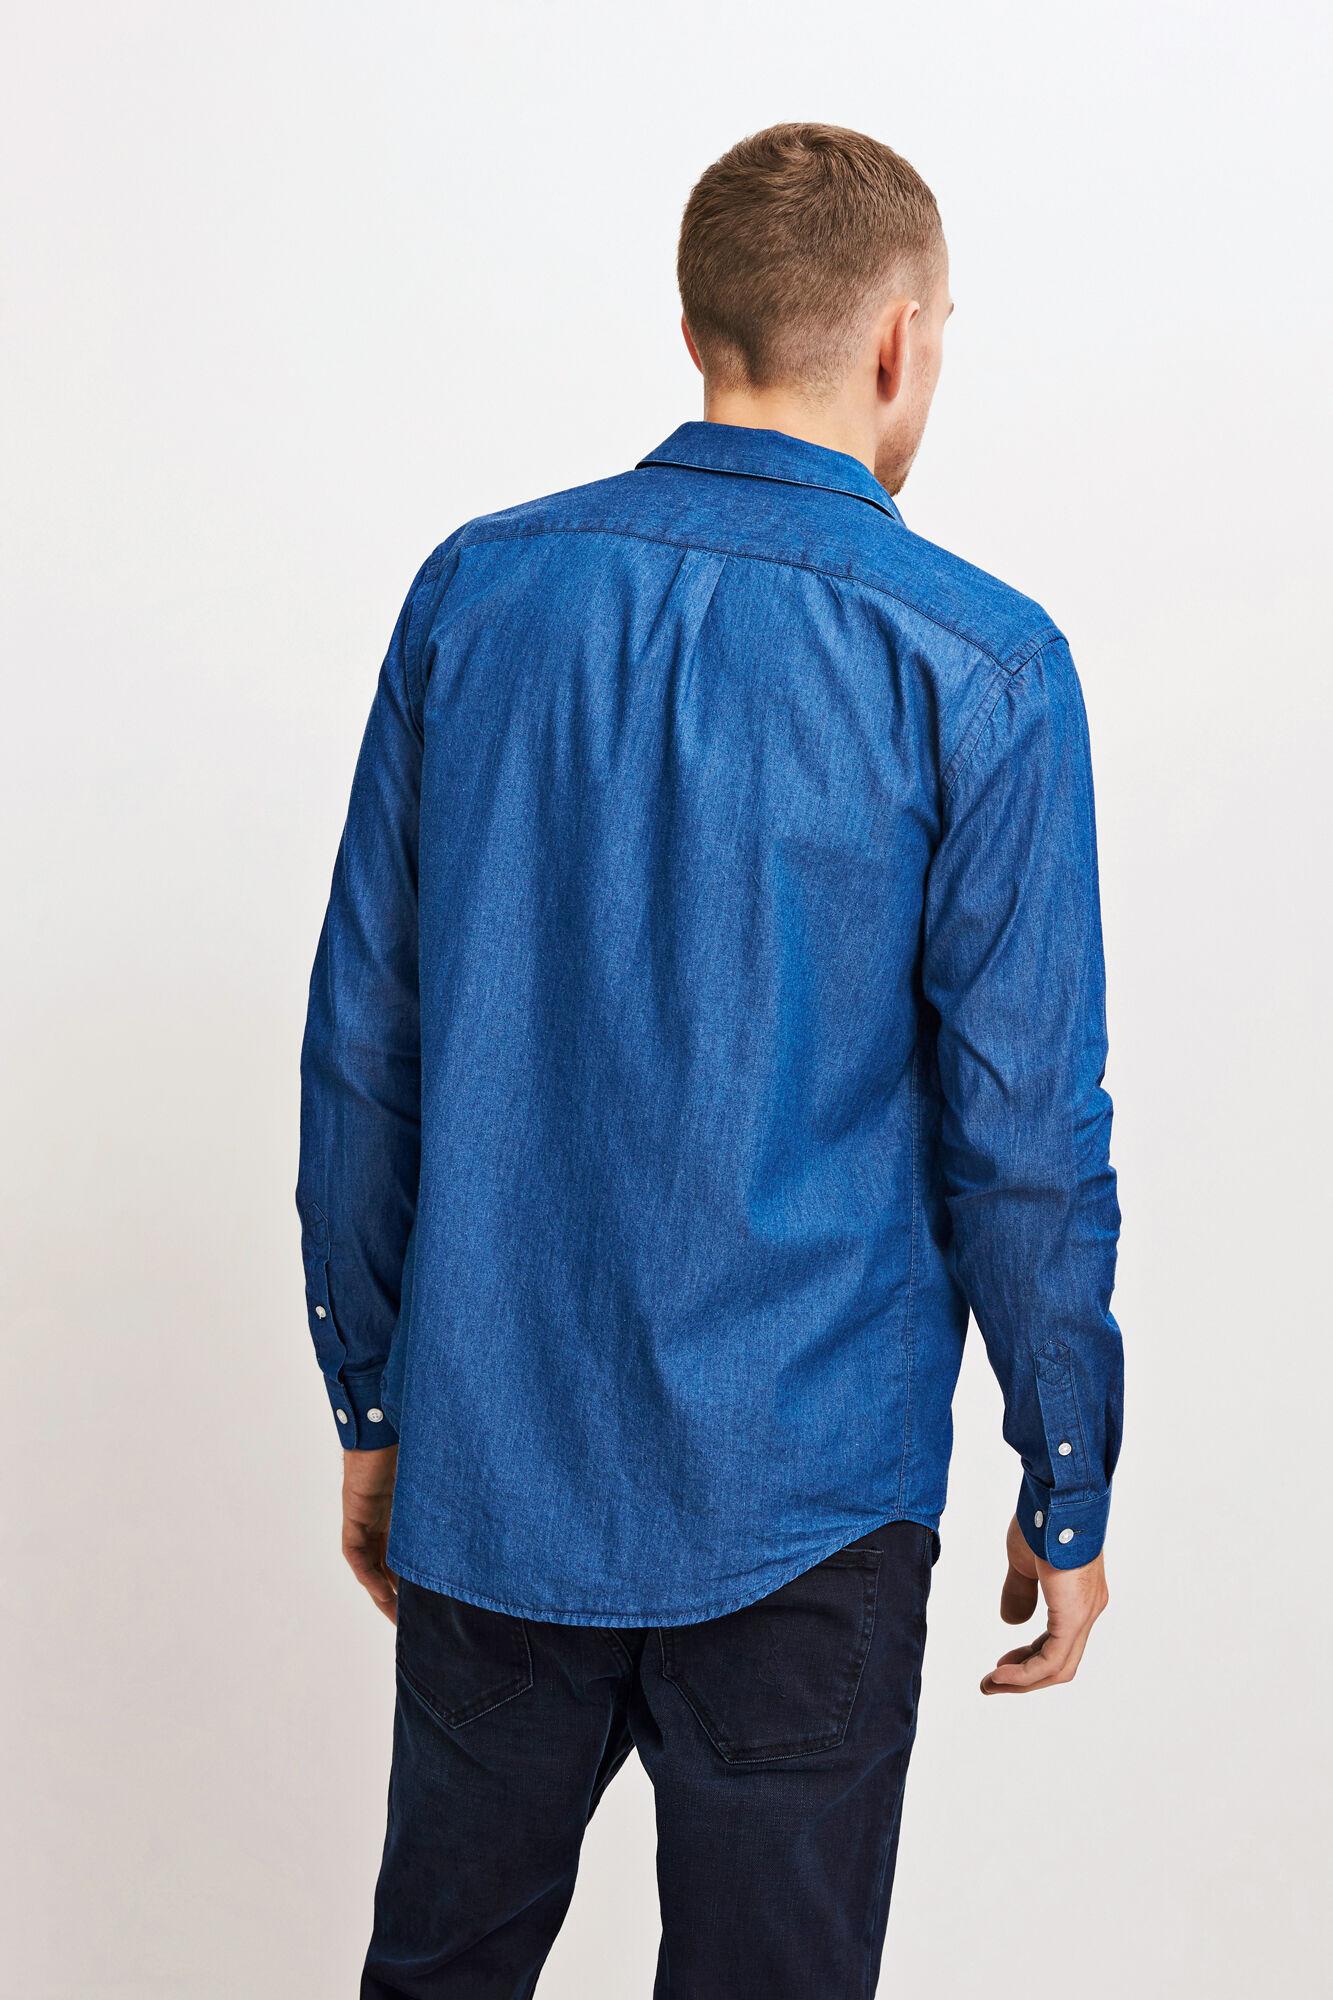 Liam NX 7728, MEDIUM BLUE DENIM